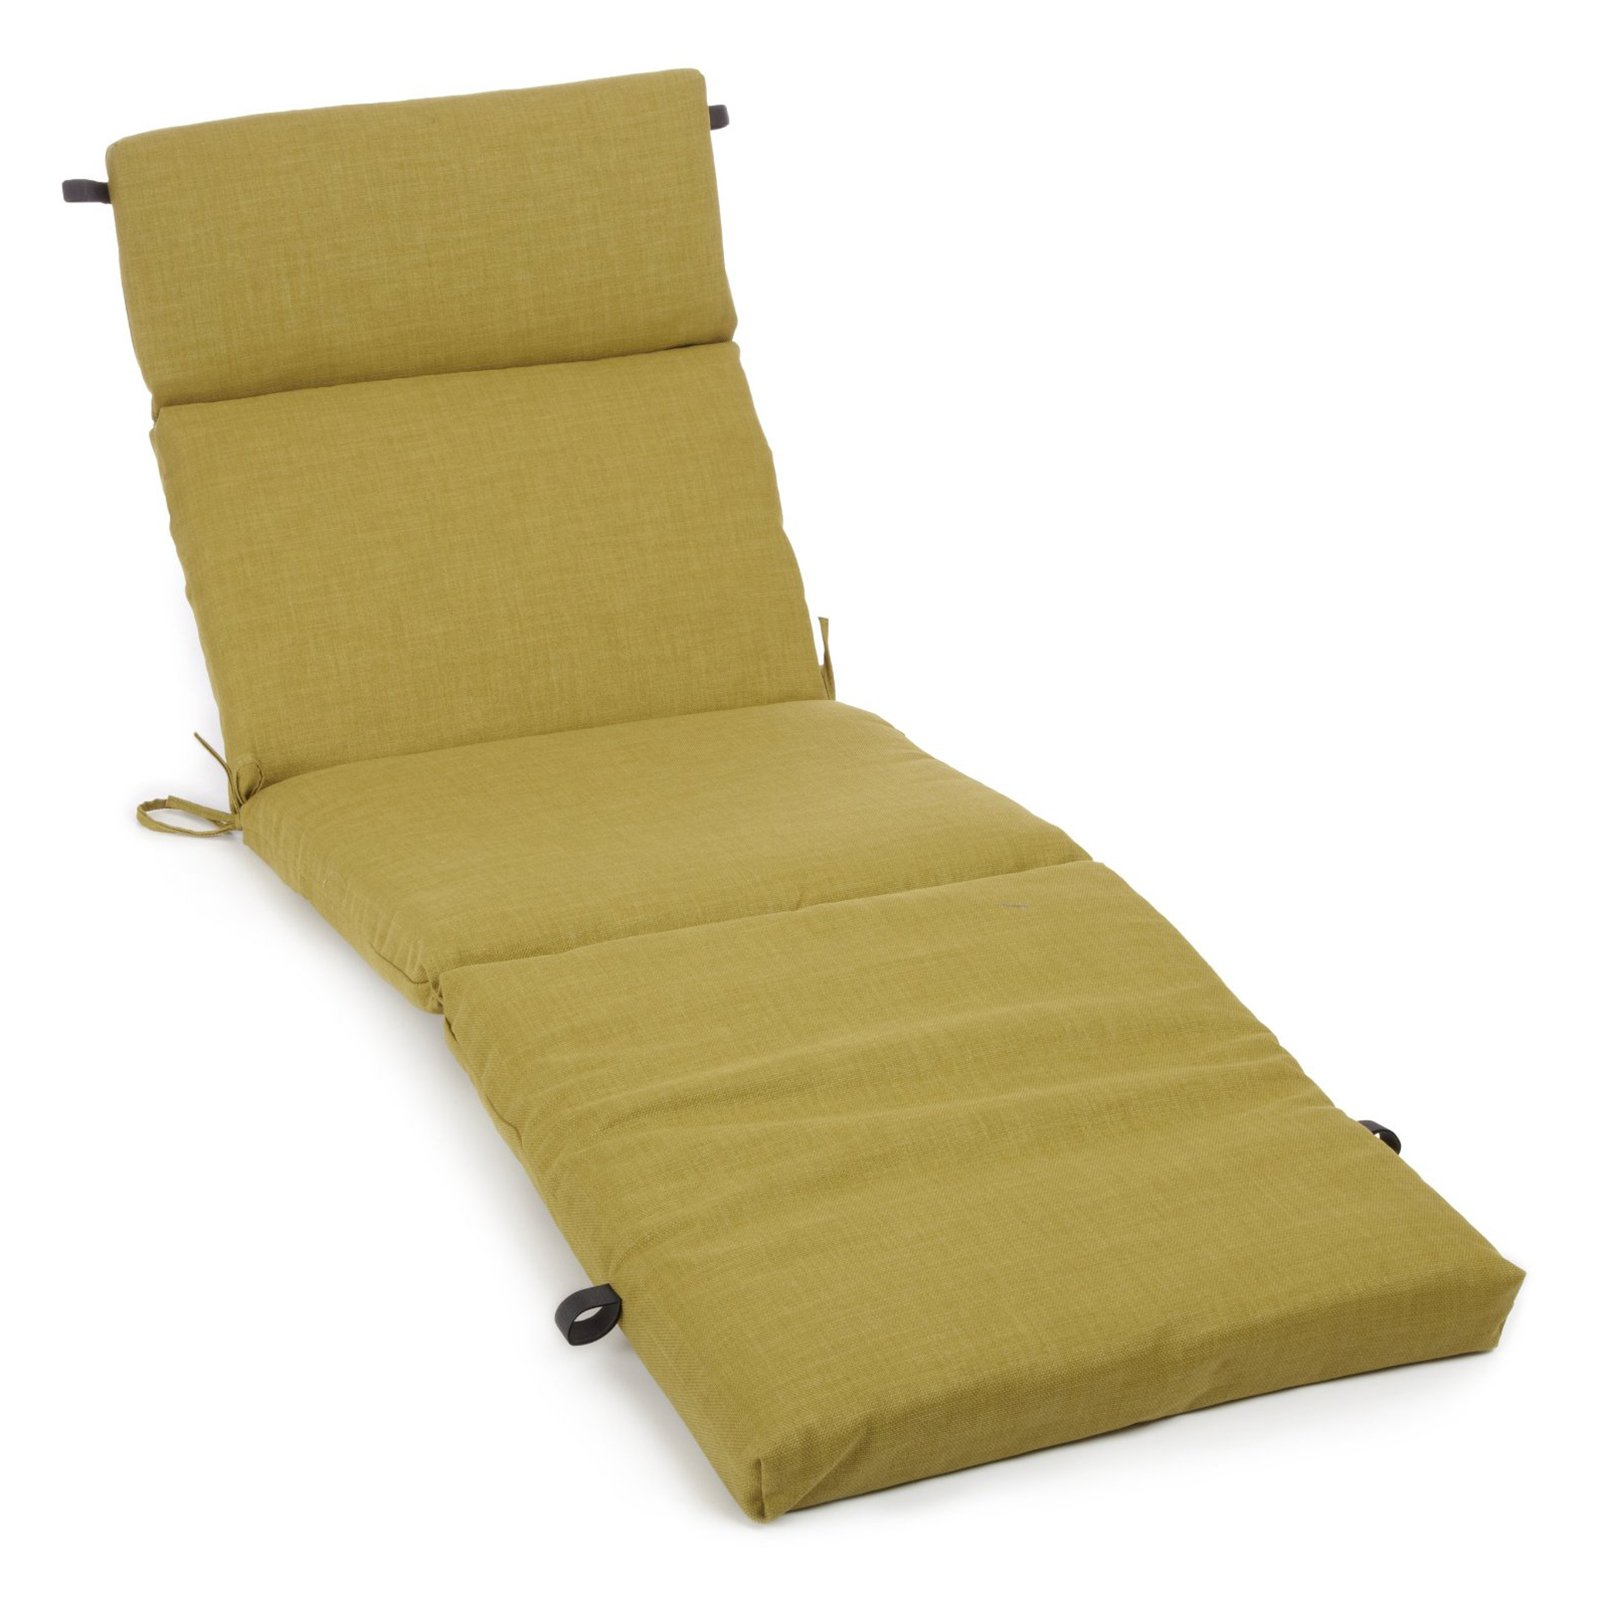 outdoor cushion cushions wayfair chaise reviews pdx indooroutdoor ateeva indoor lounge sunbrella